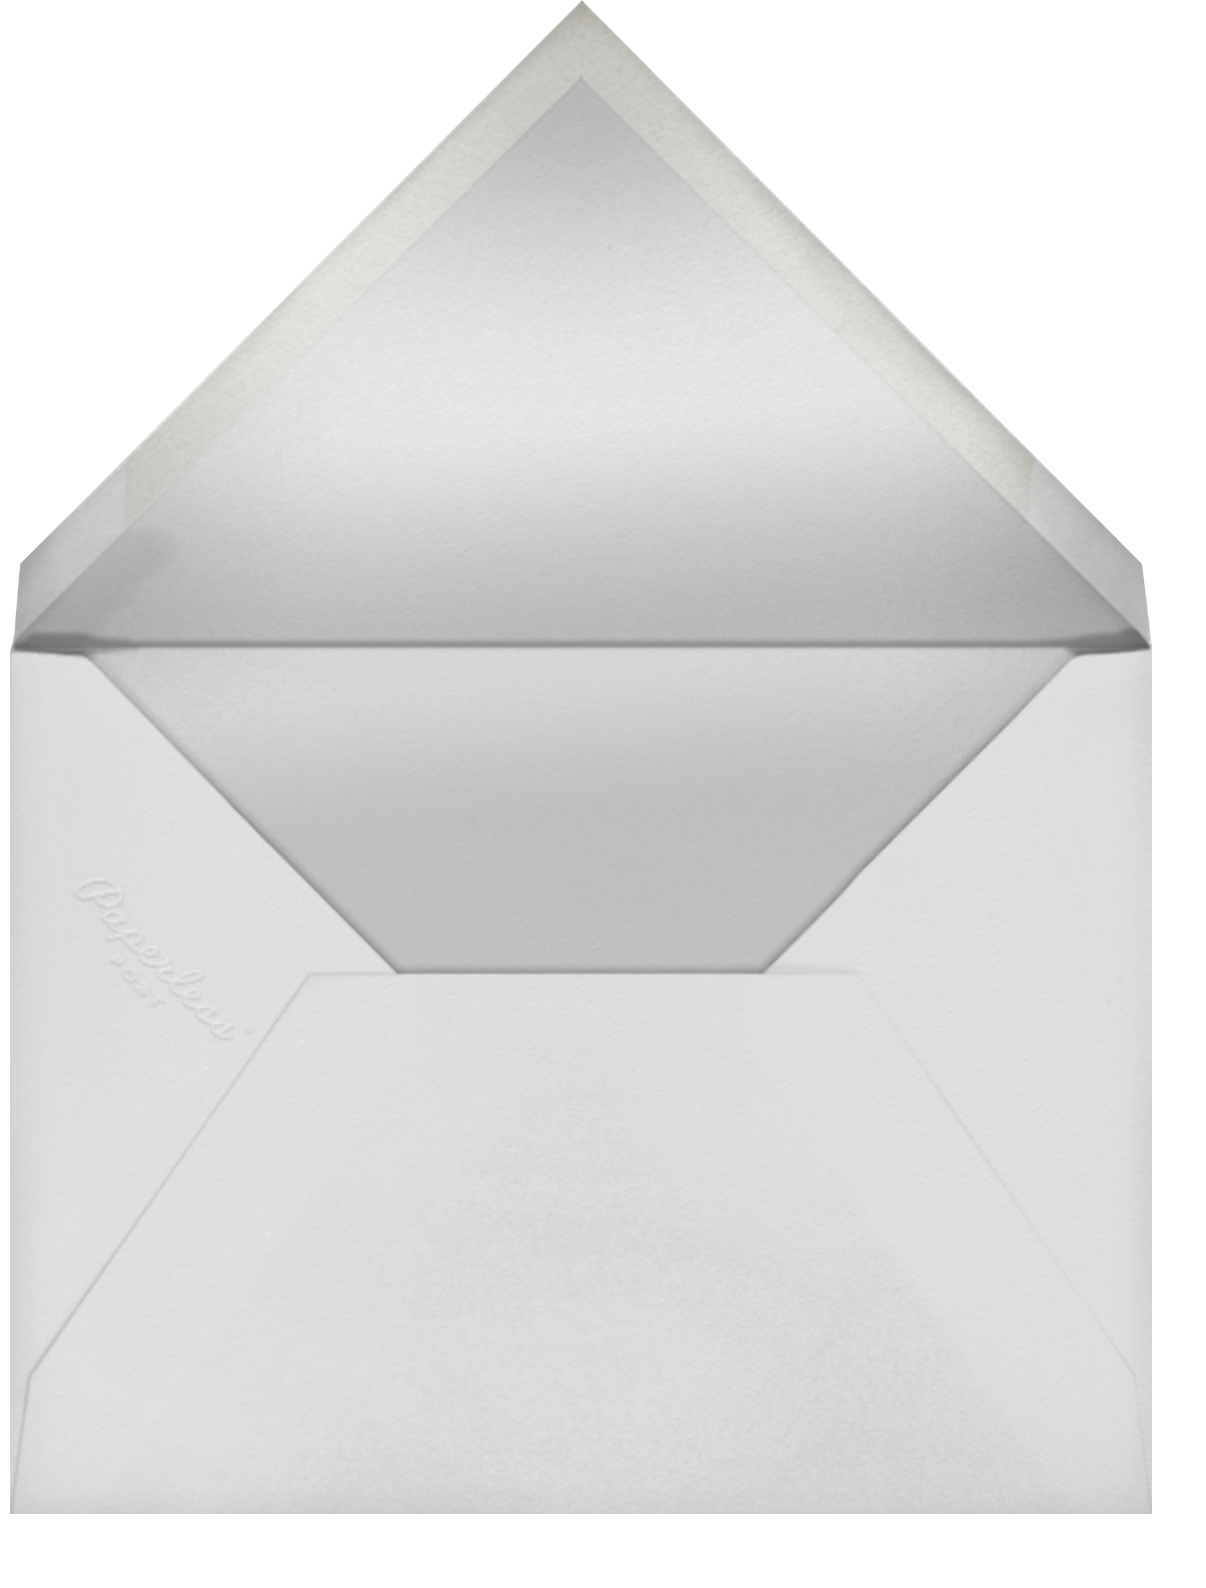 Sydney Skyline View (Menu) - White/Black - Paperless Post - Menus - envelope back